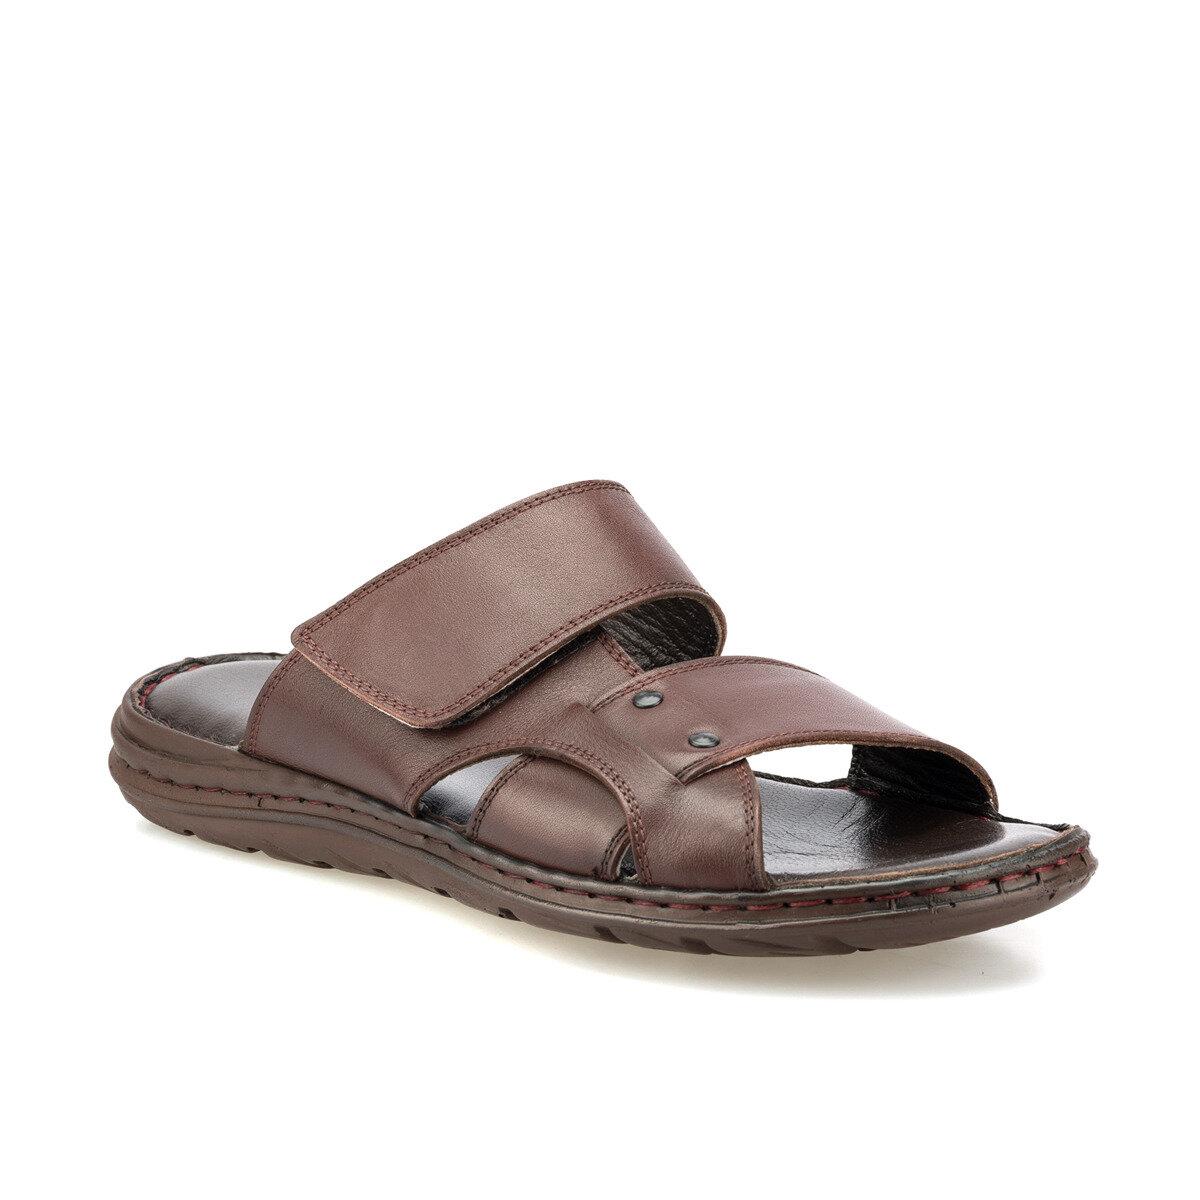 Flo 160264.m brown masculino chinelos polaris